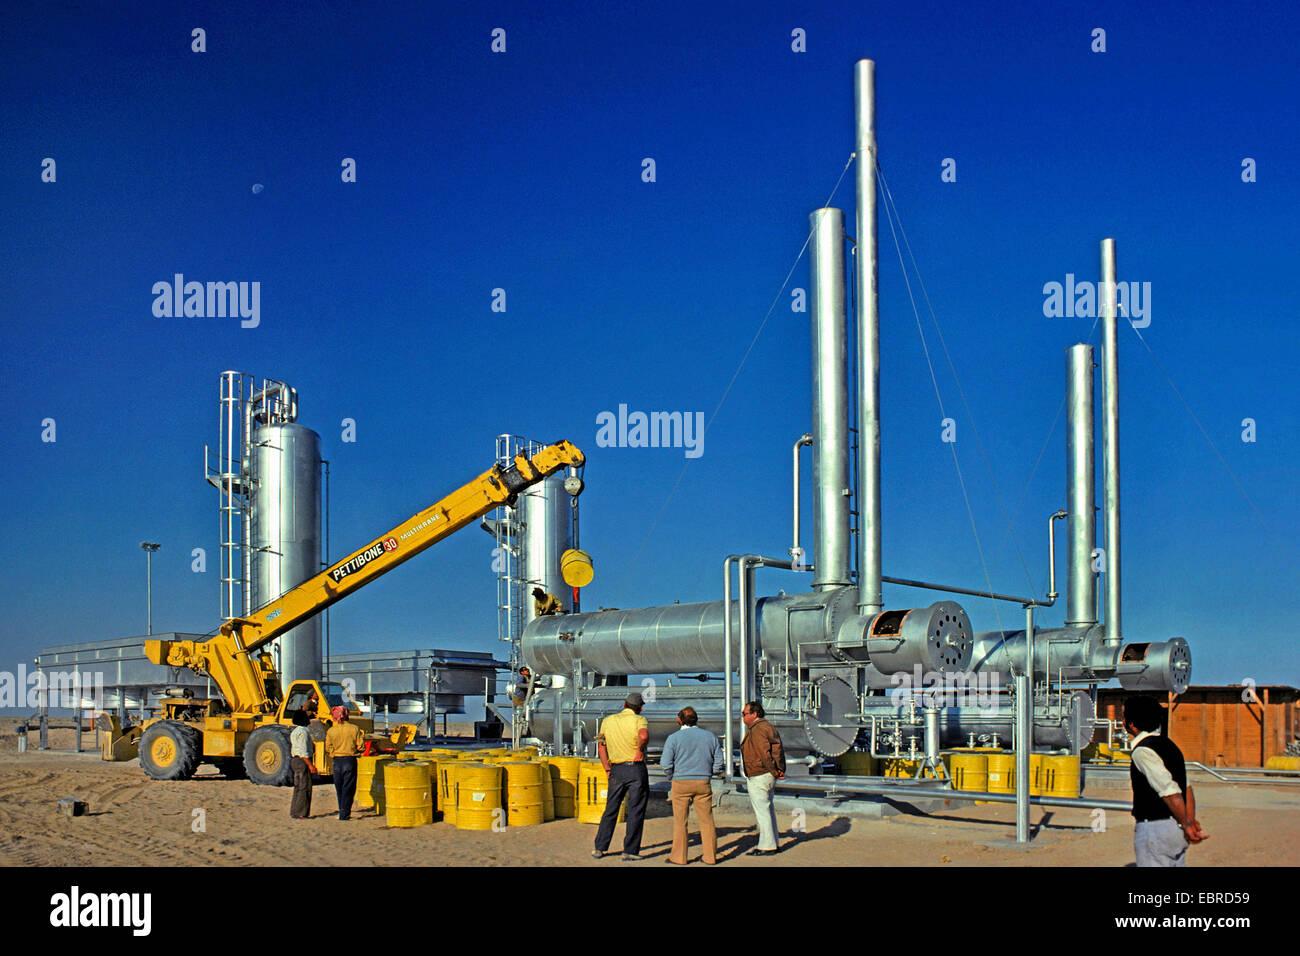 Kerosene pumping station, Iraq, Rumaila - Stock Image